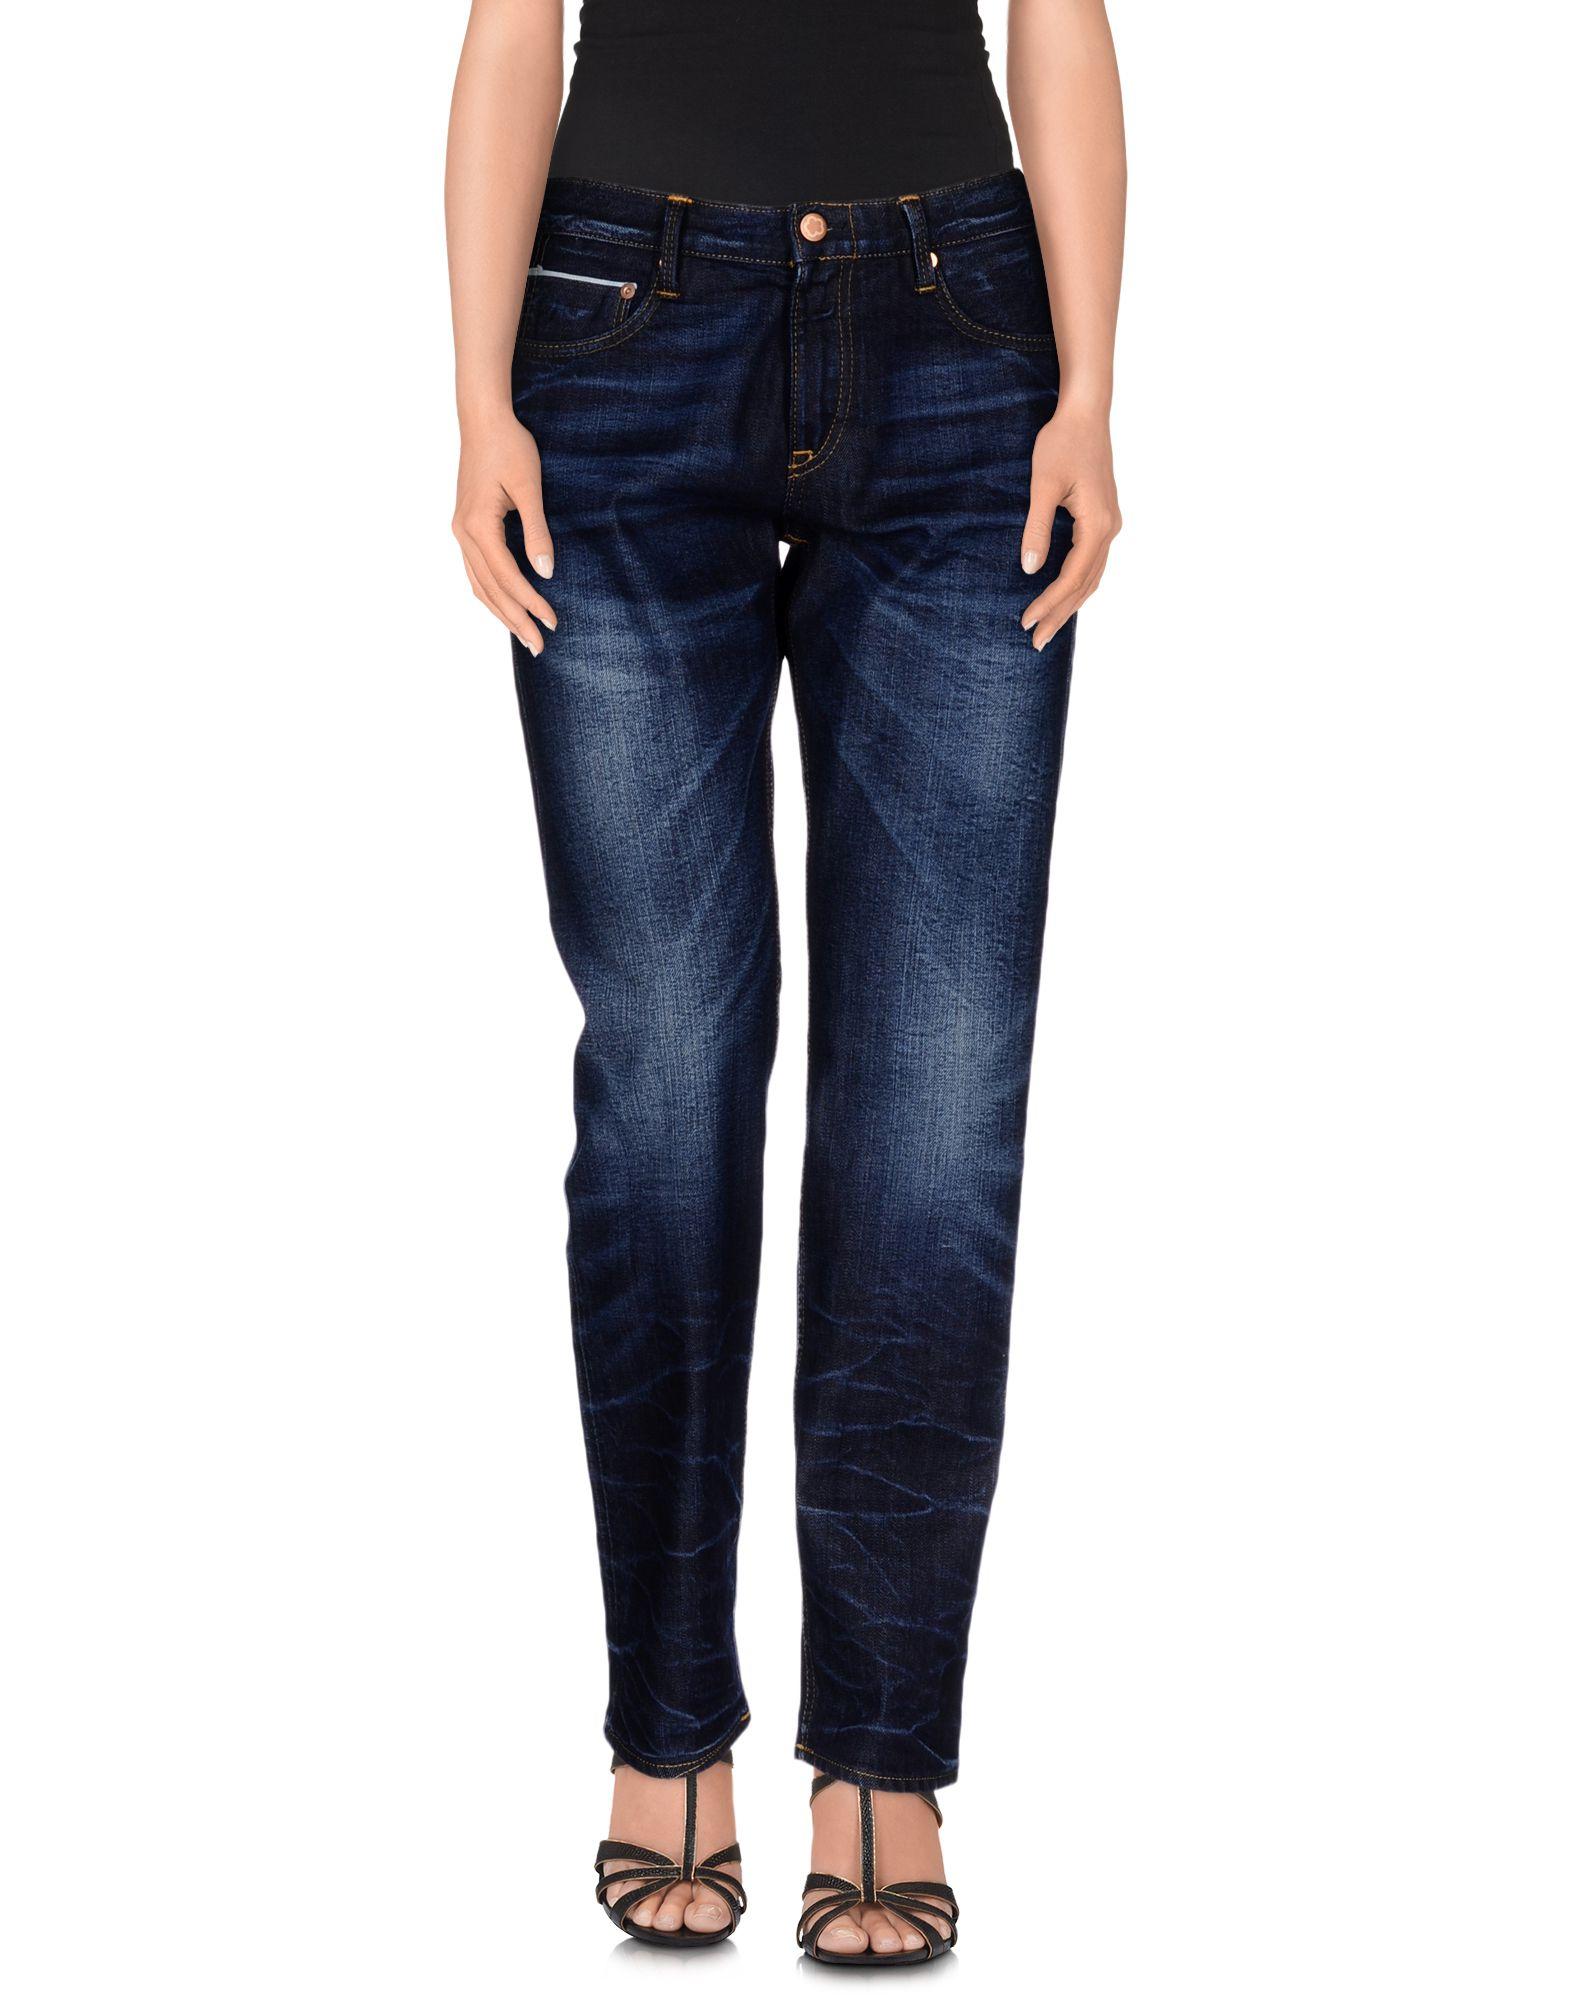 CARE LABEL Denim Pants in Blue